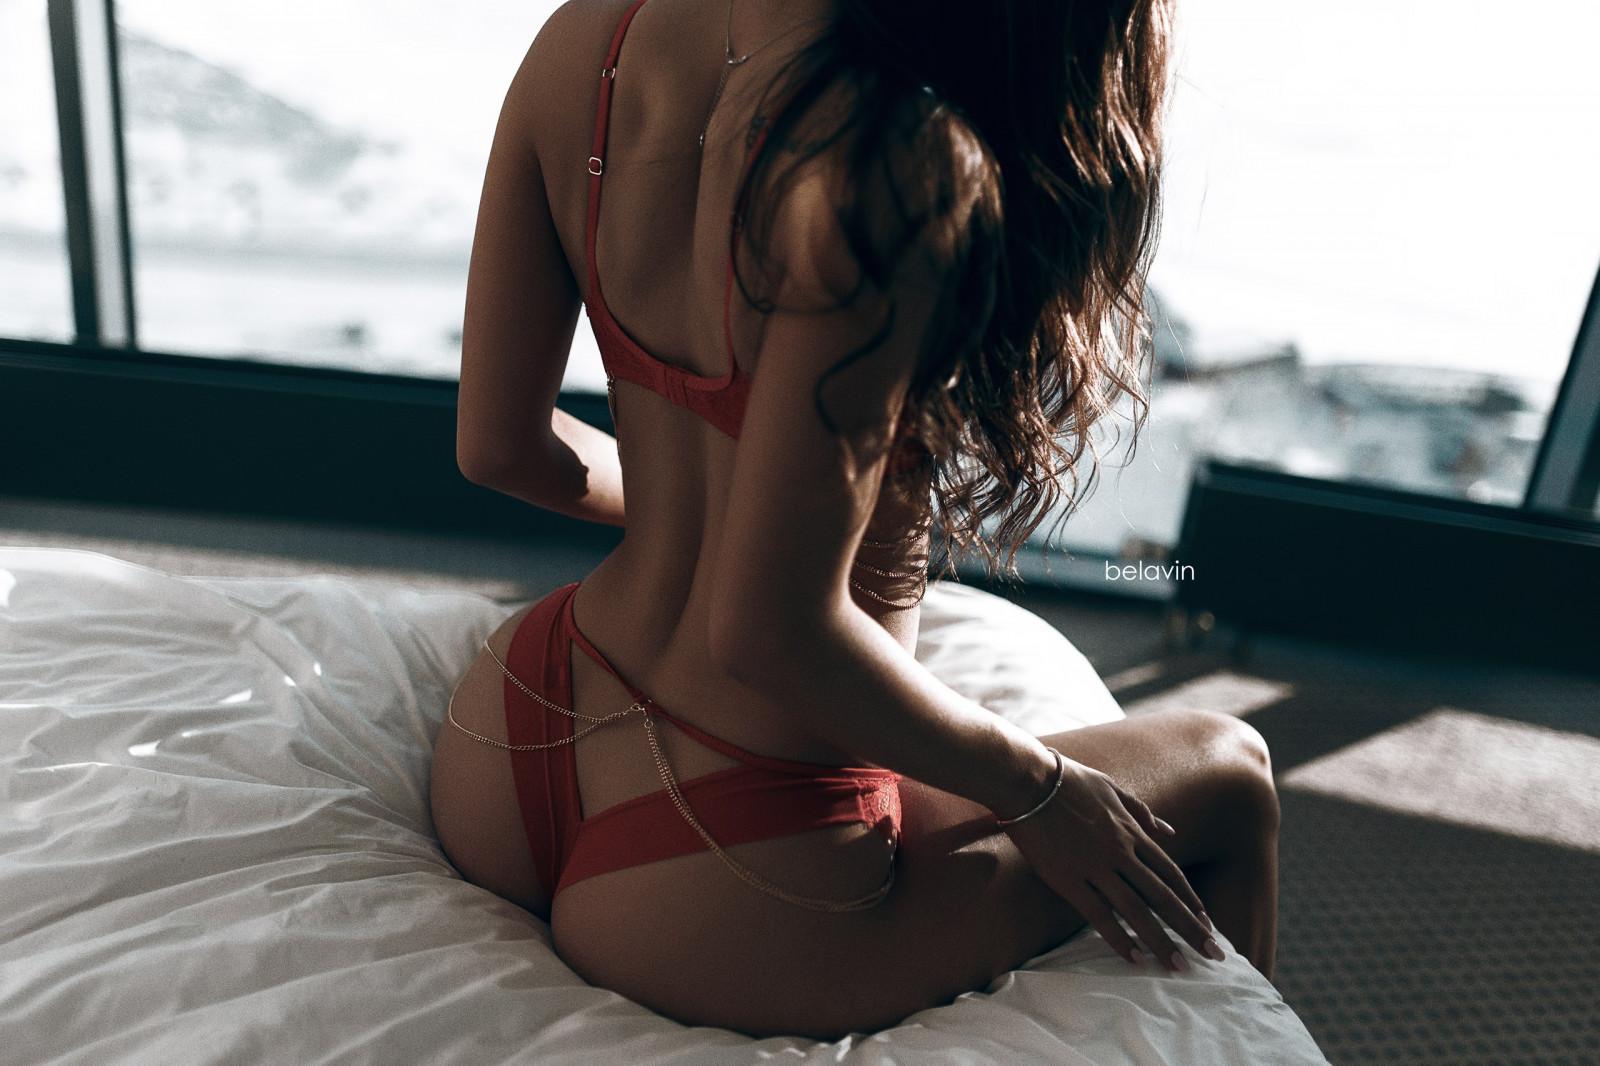 erotichnie-foto-shatenki-so-spini